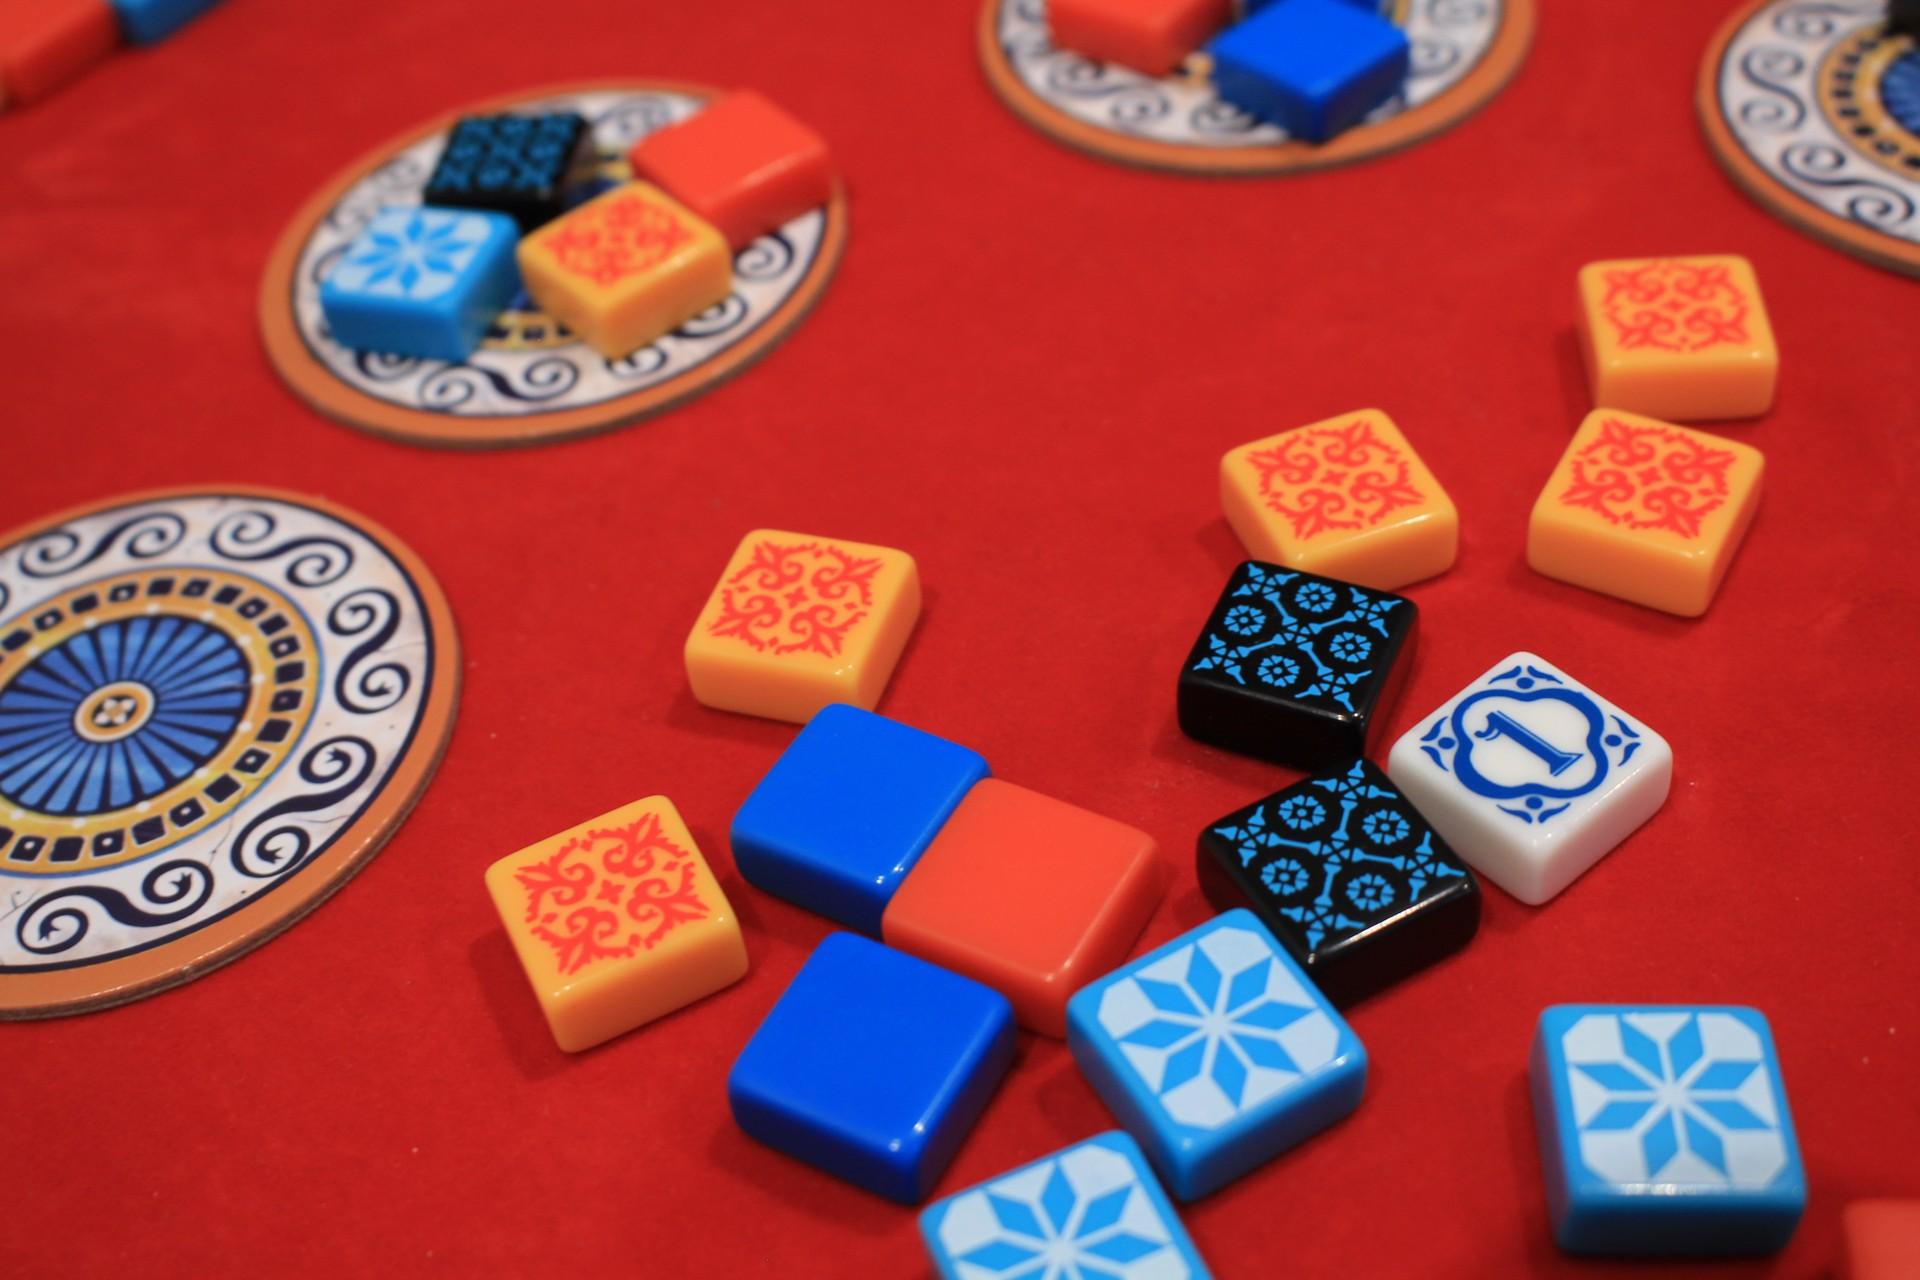 Azul czy Sagrada?